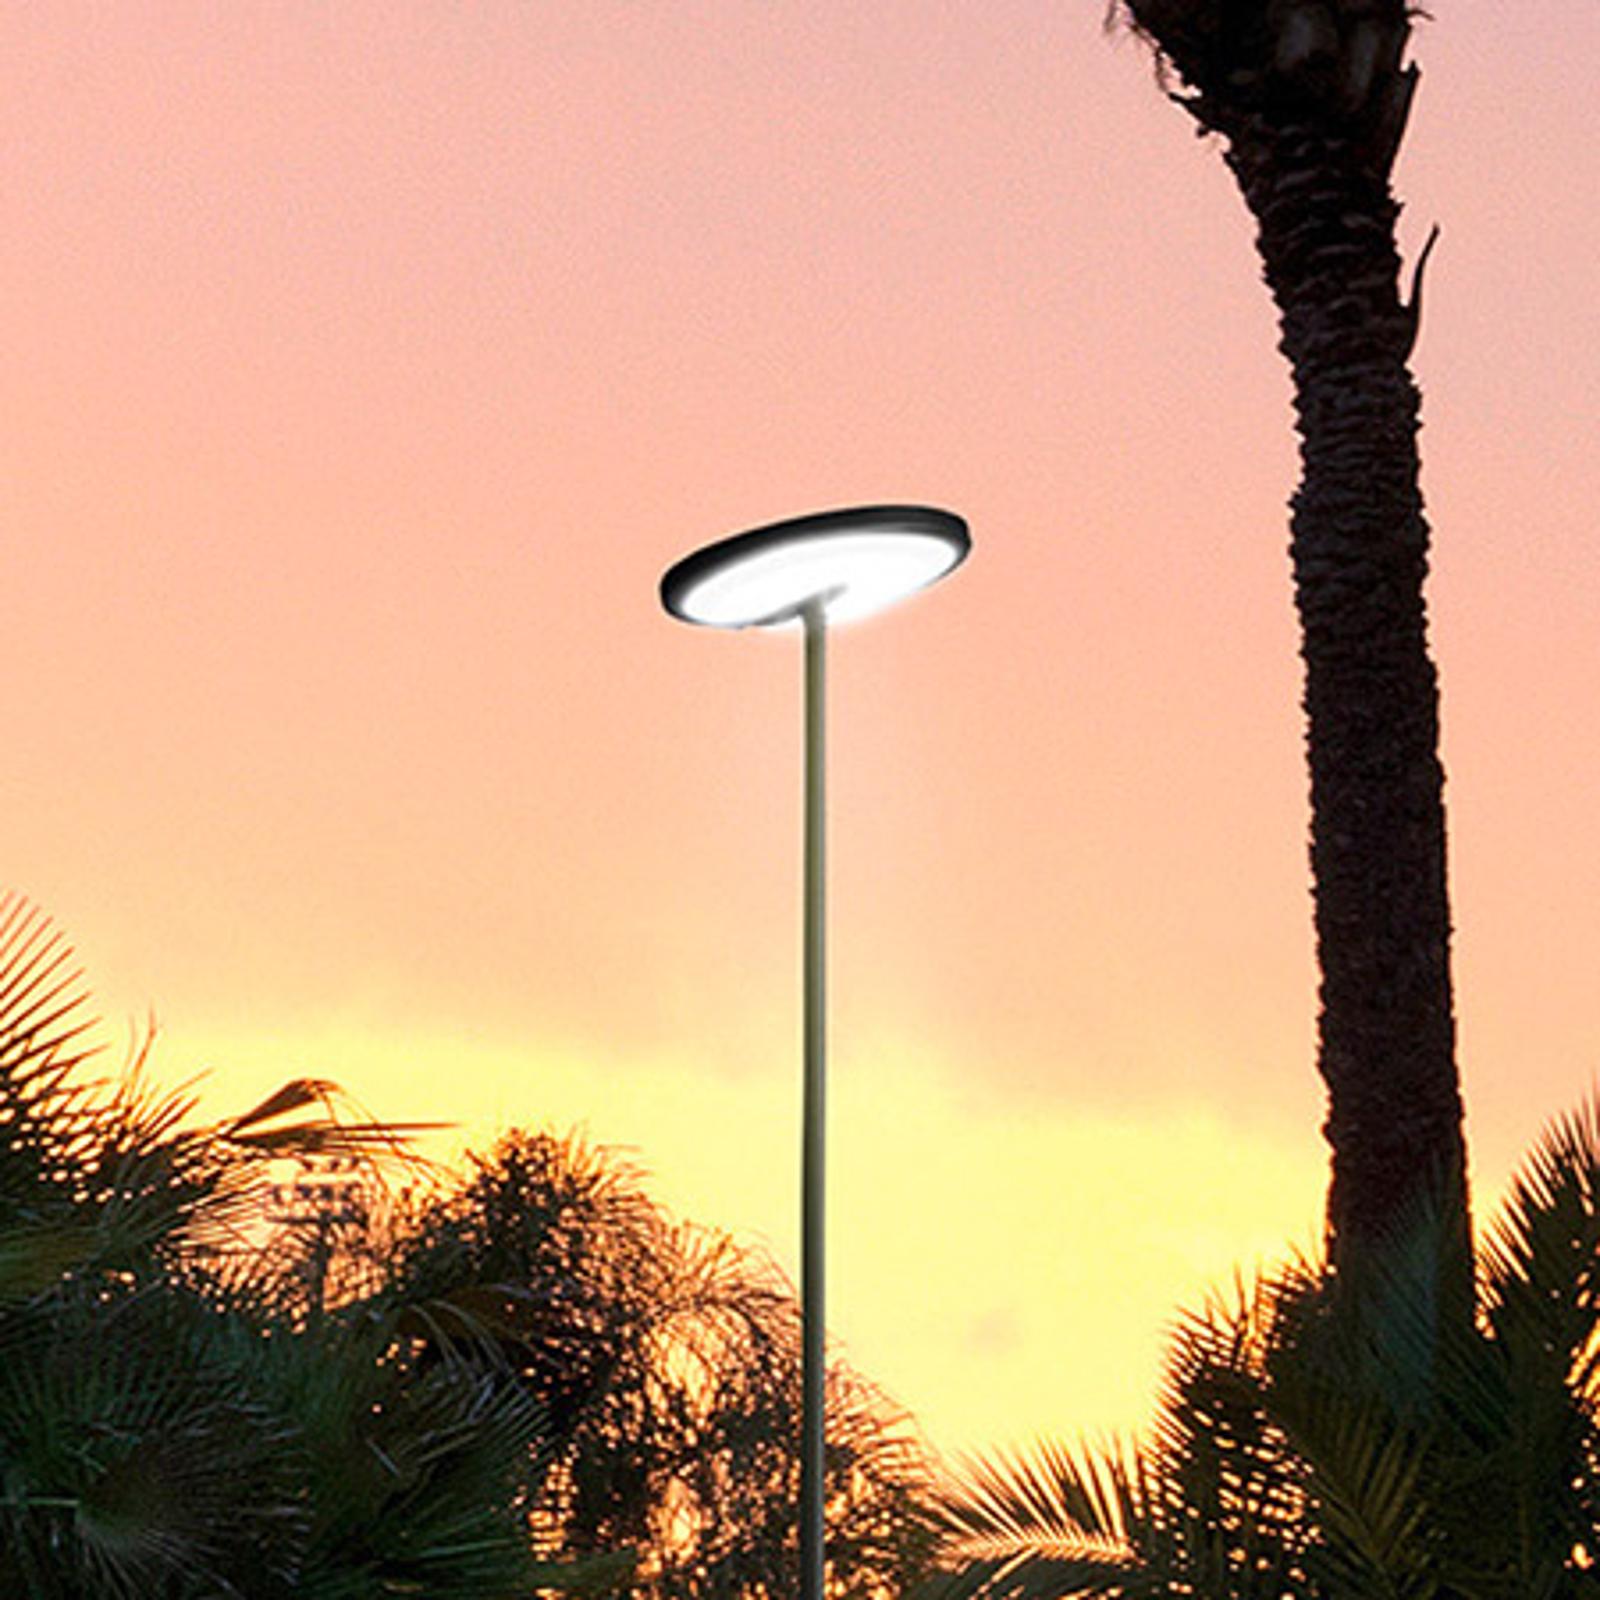 LED-Mastleuchte Invisible IP54